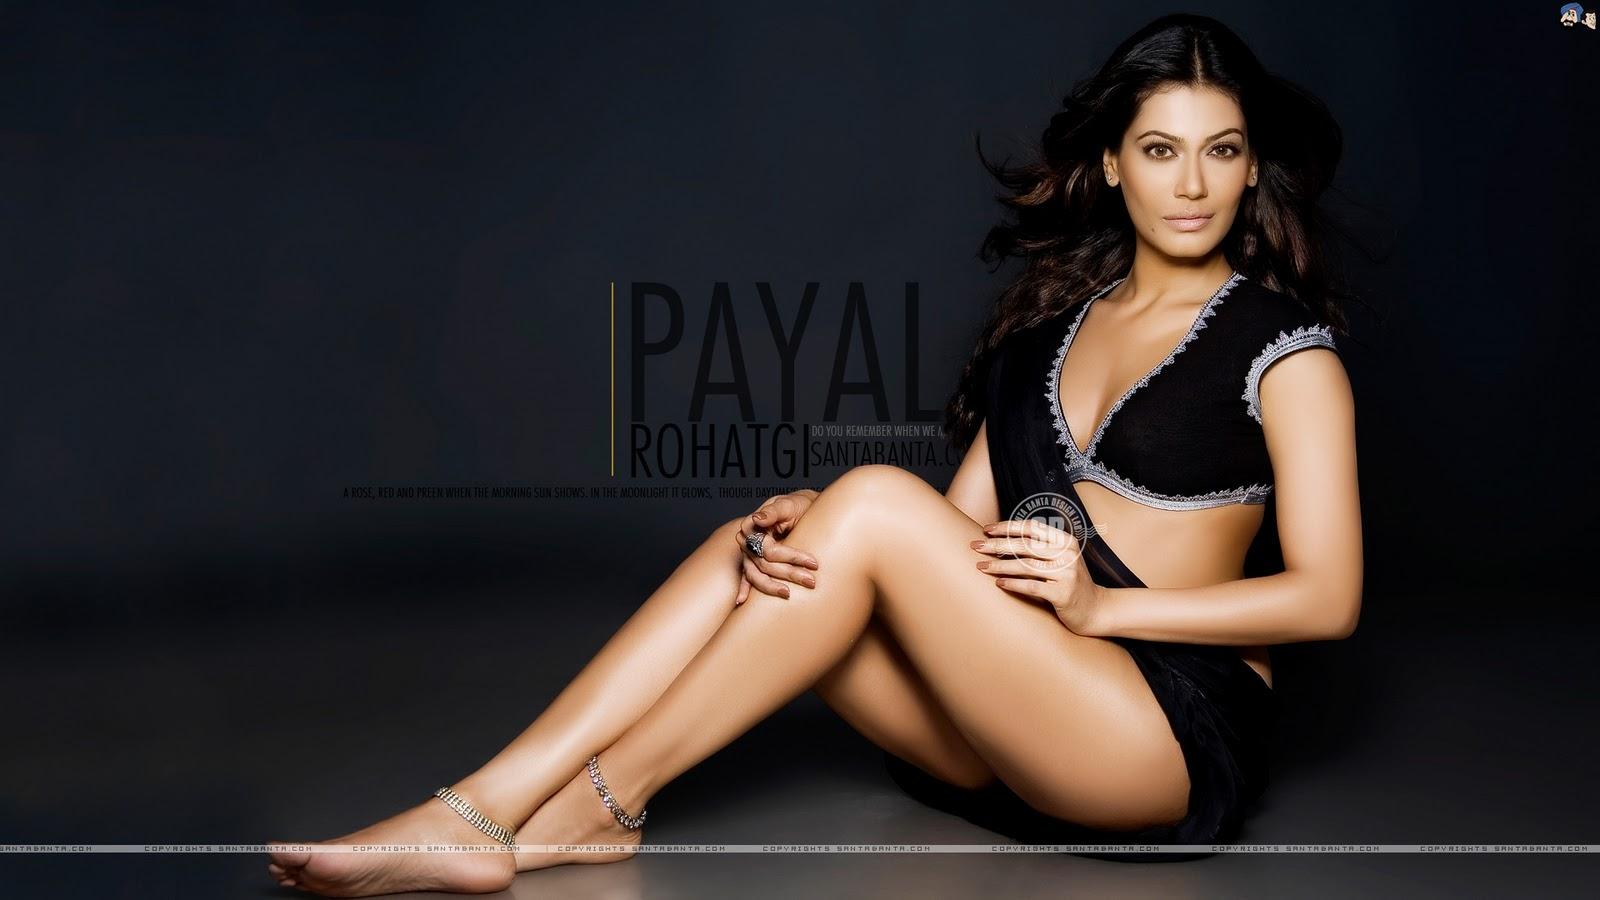 Butt Payal Rohatgi nude (65 pics) Hacked, 2020, legs